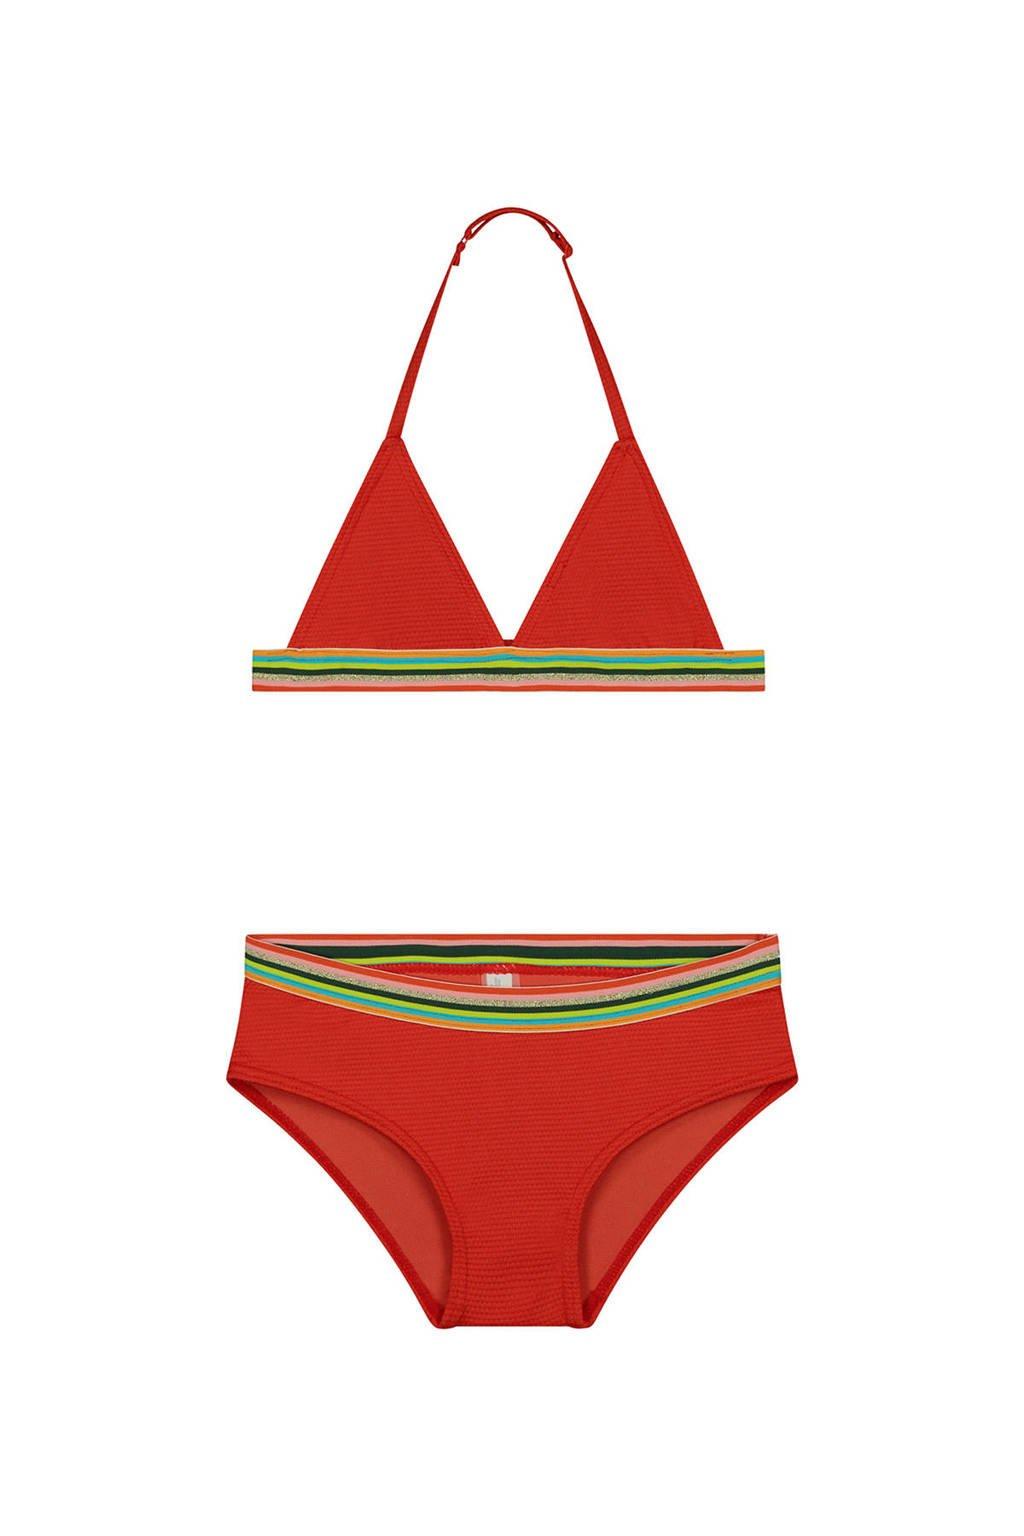 Shiwi triangel bikini Rainbow rood, Rood/groen/lime/roze/lichtblauw